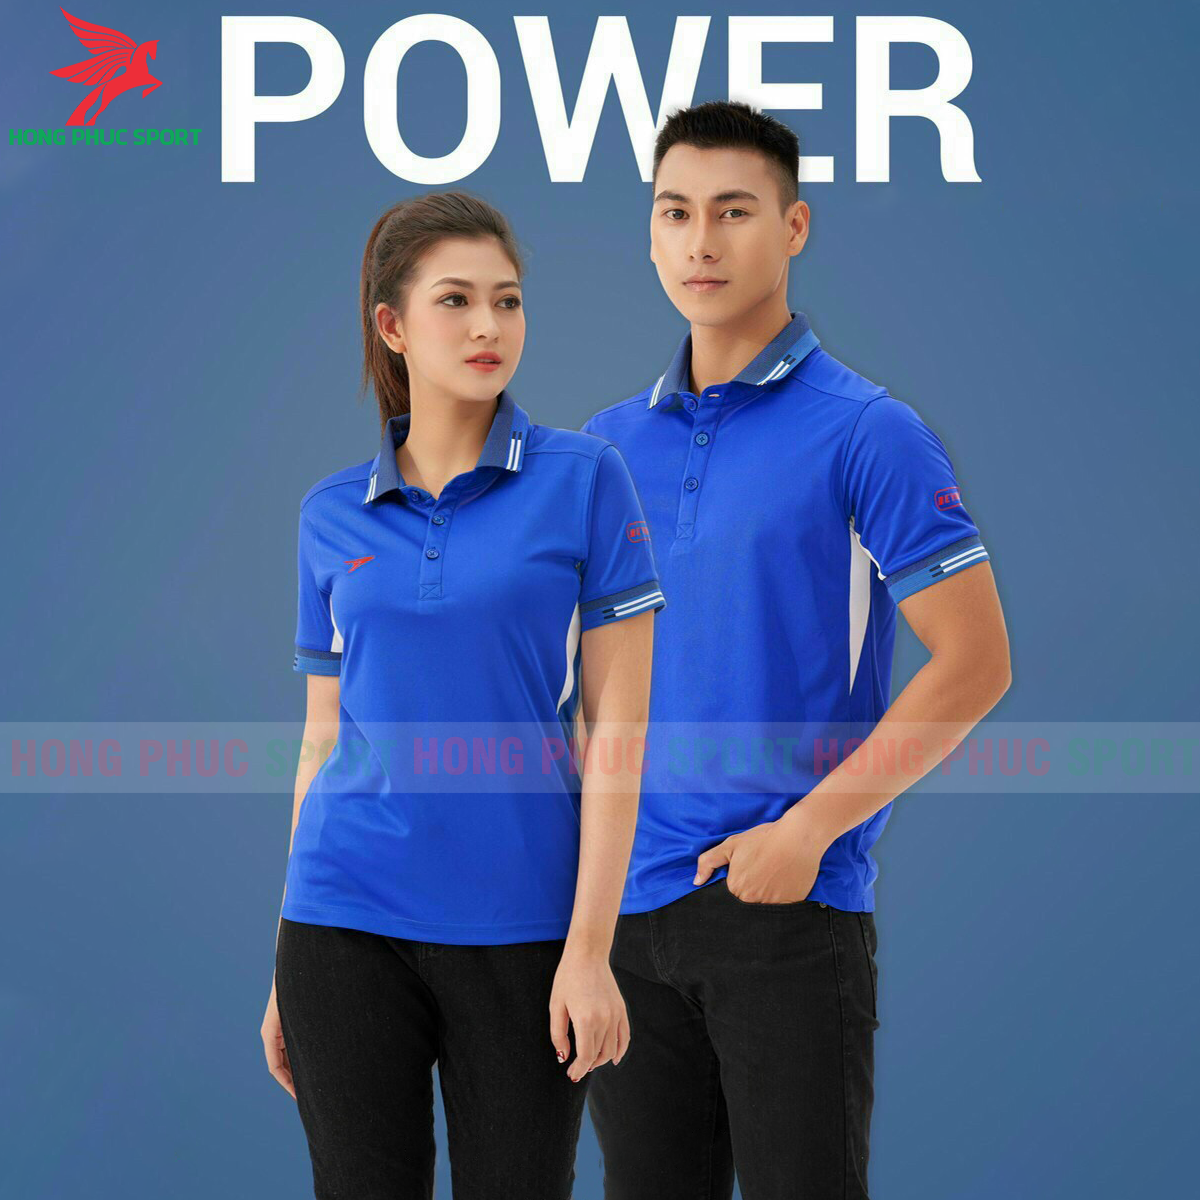 https://cdn.hongphucsport.com/unsafe/s4.shopbay.vn/files/285/ao-polo-beyono-power-2021-mau-xanh-bich-609de96bc2c02.png